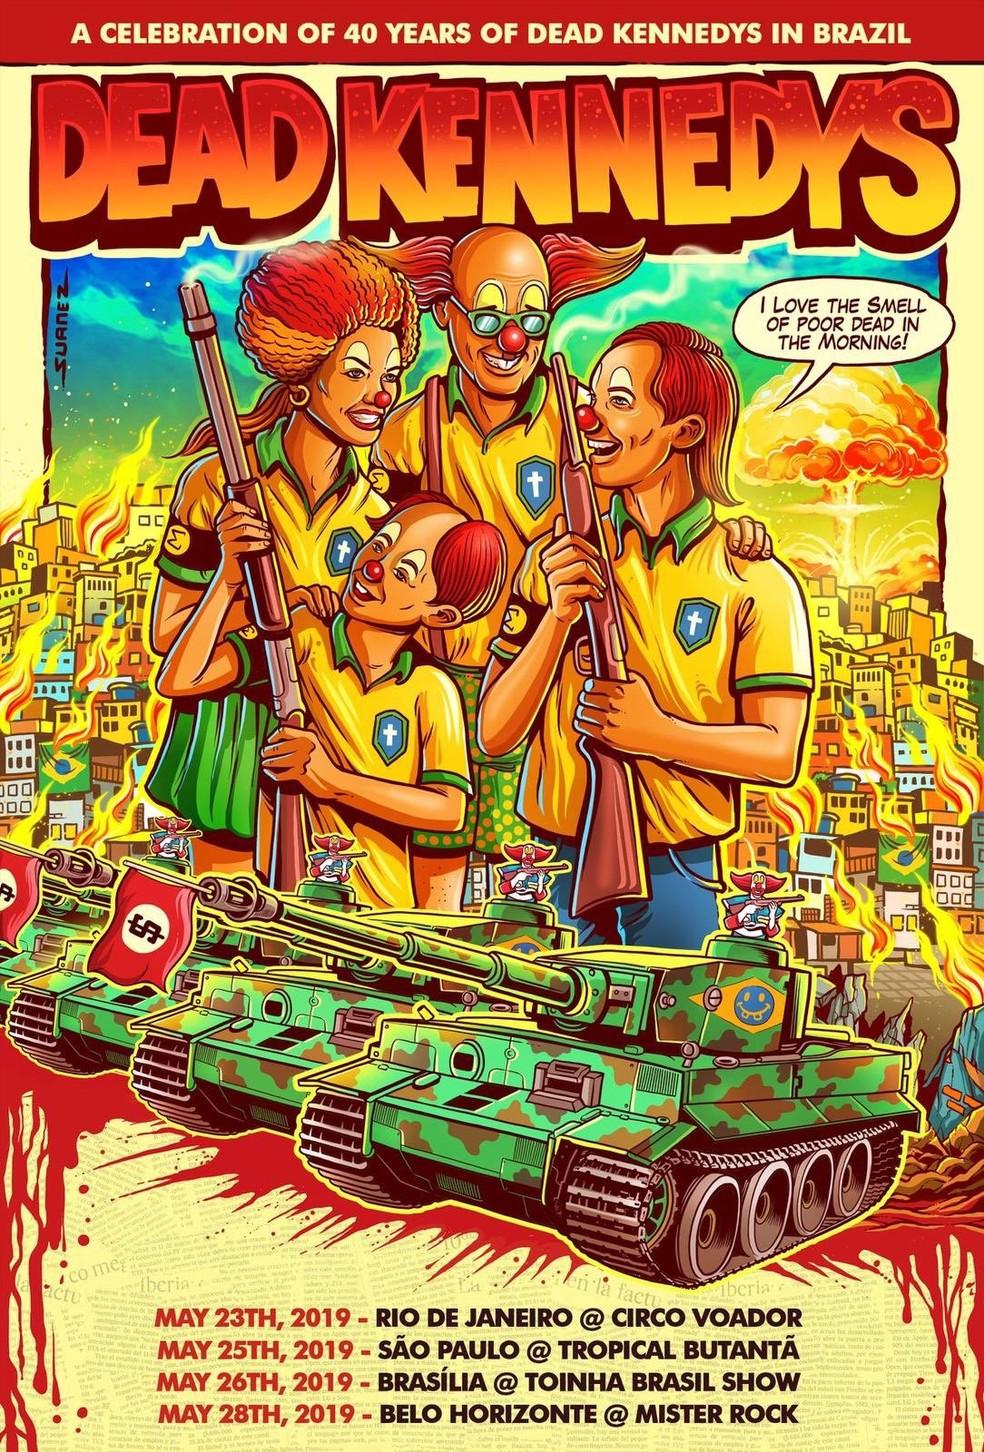 Dead Kennedys cancela shows da turnê no Brasil após polêmica de cartaz